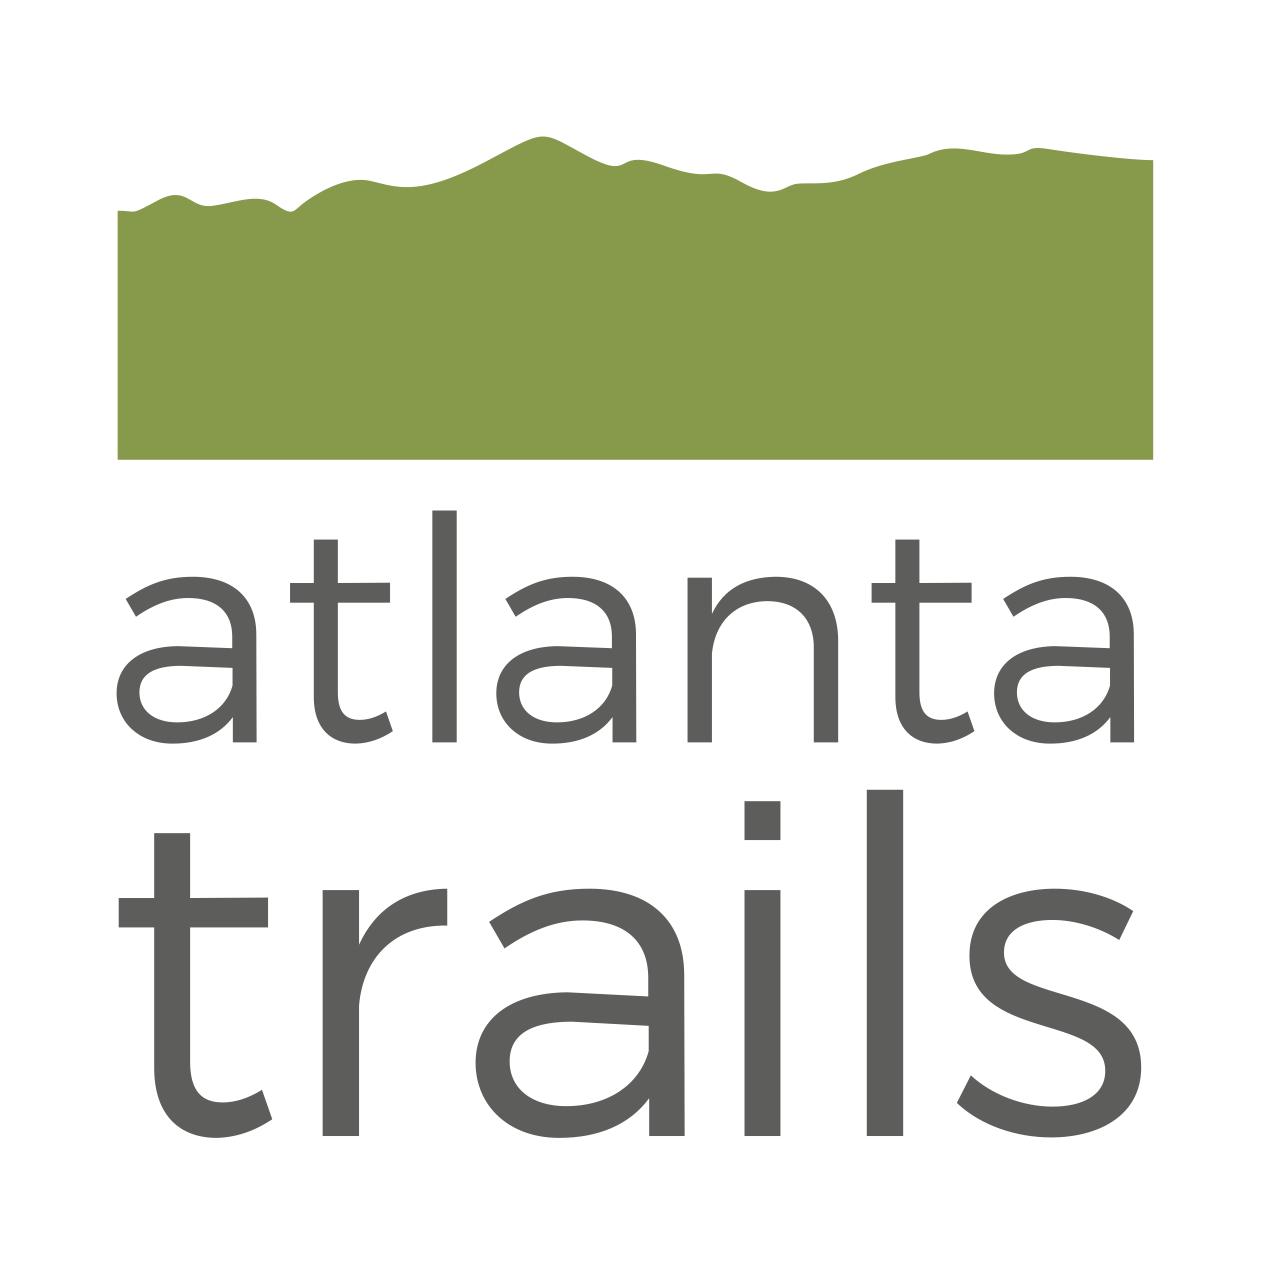 Atlanta trails sq